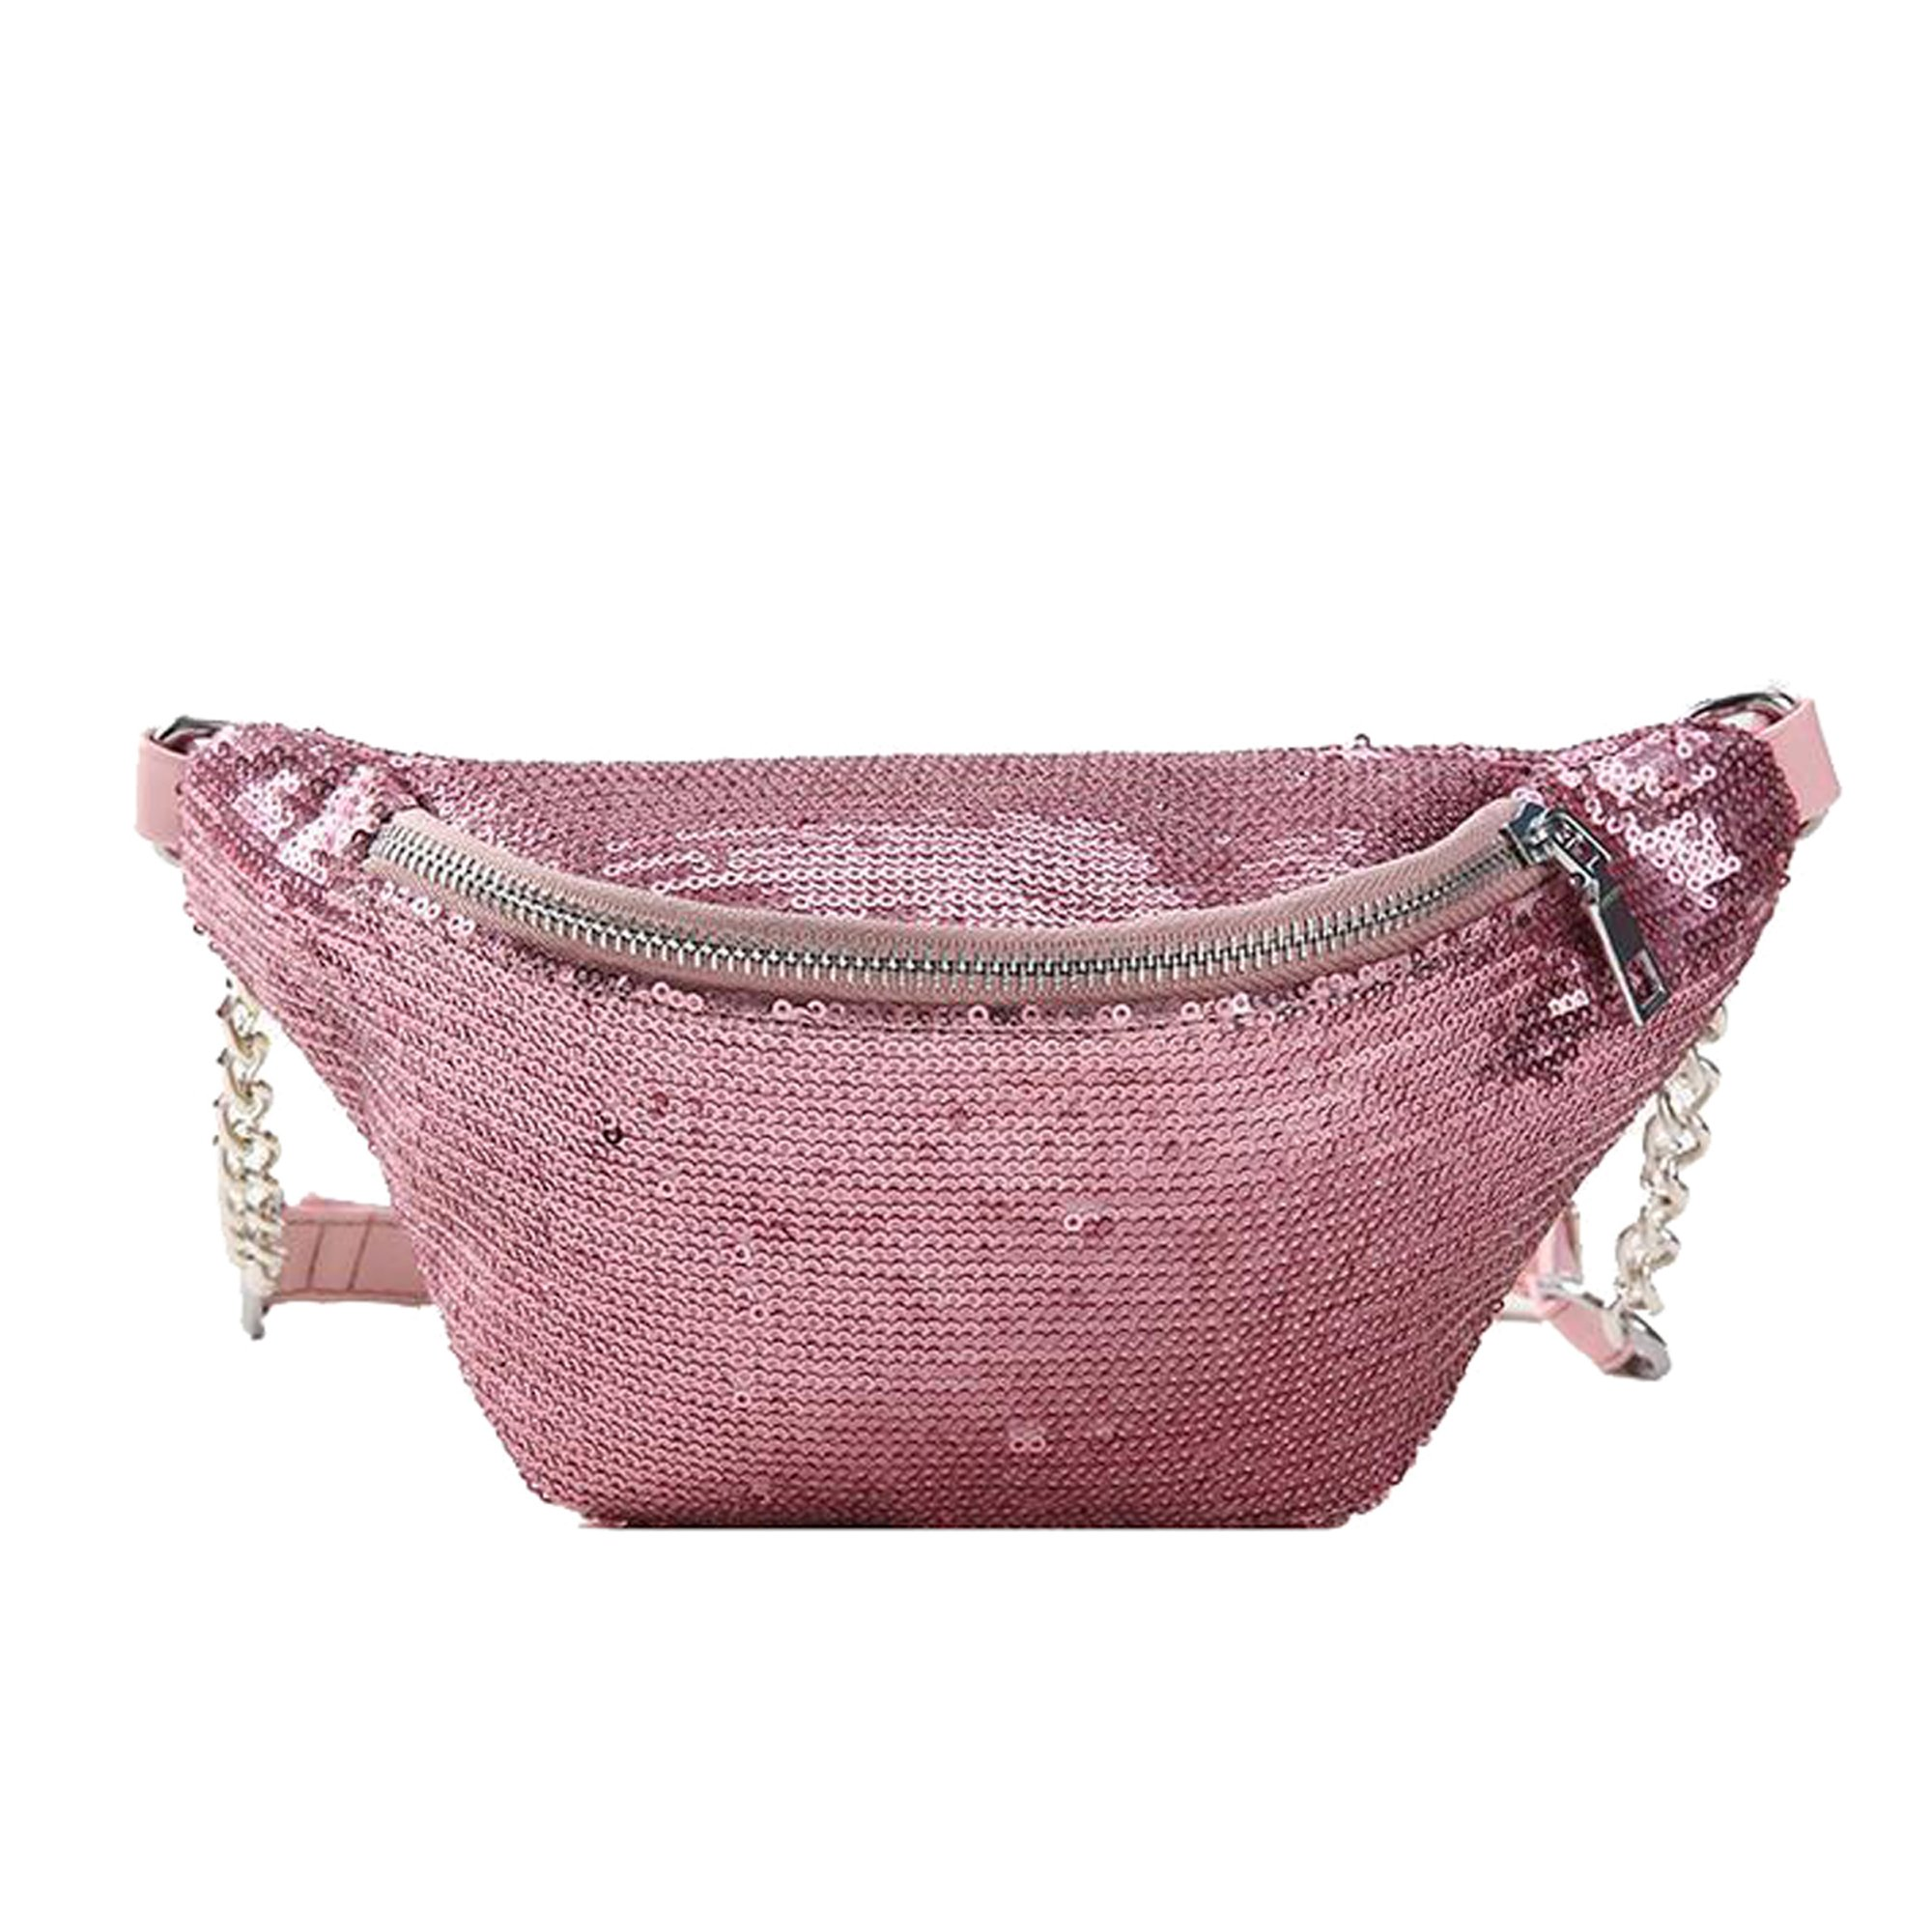 Womens Sequined Waist Fanny Pack Belt Pouch Sling Chest Bag Crossbody Hip Purse (pink)